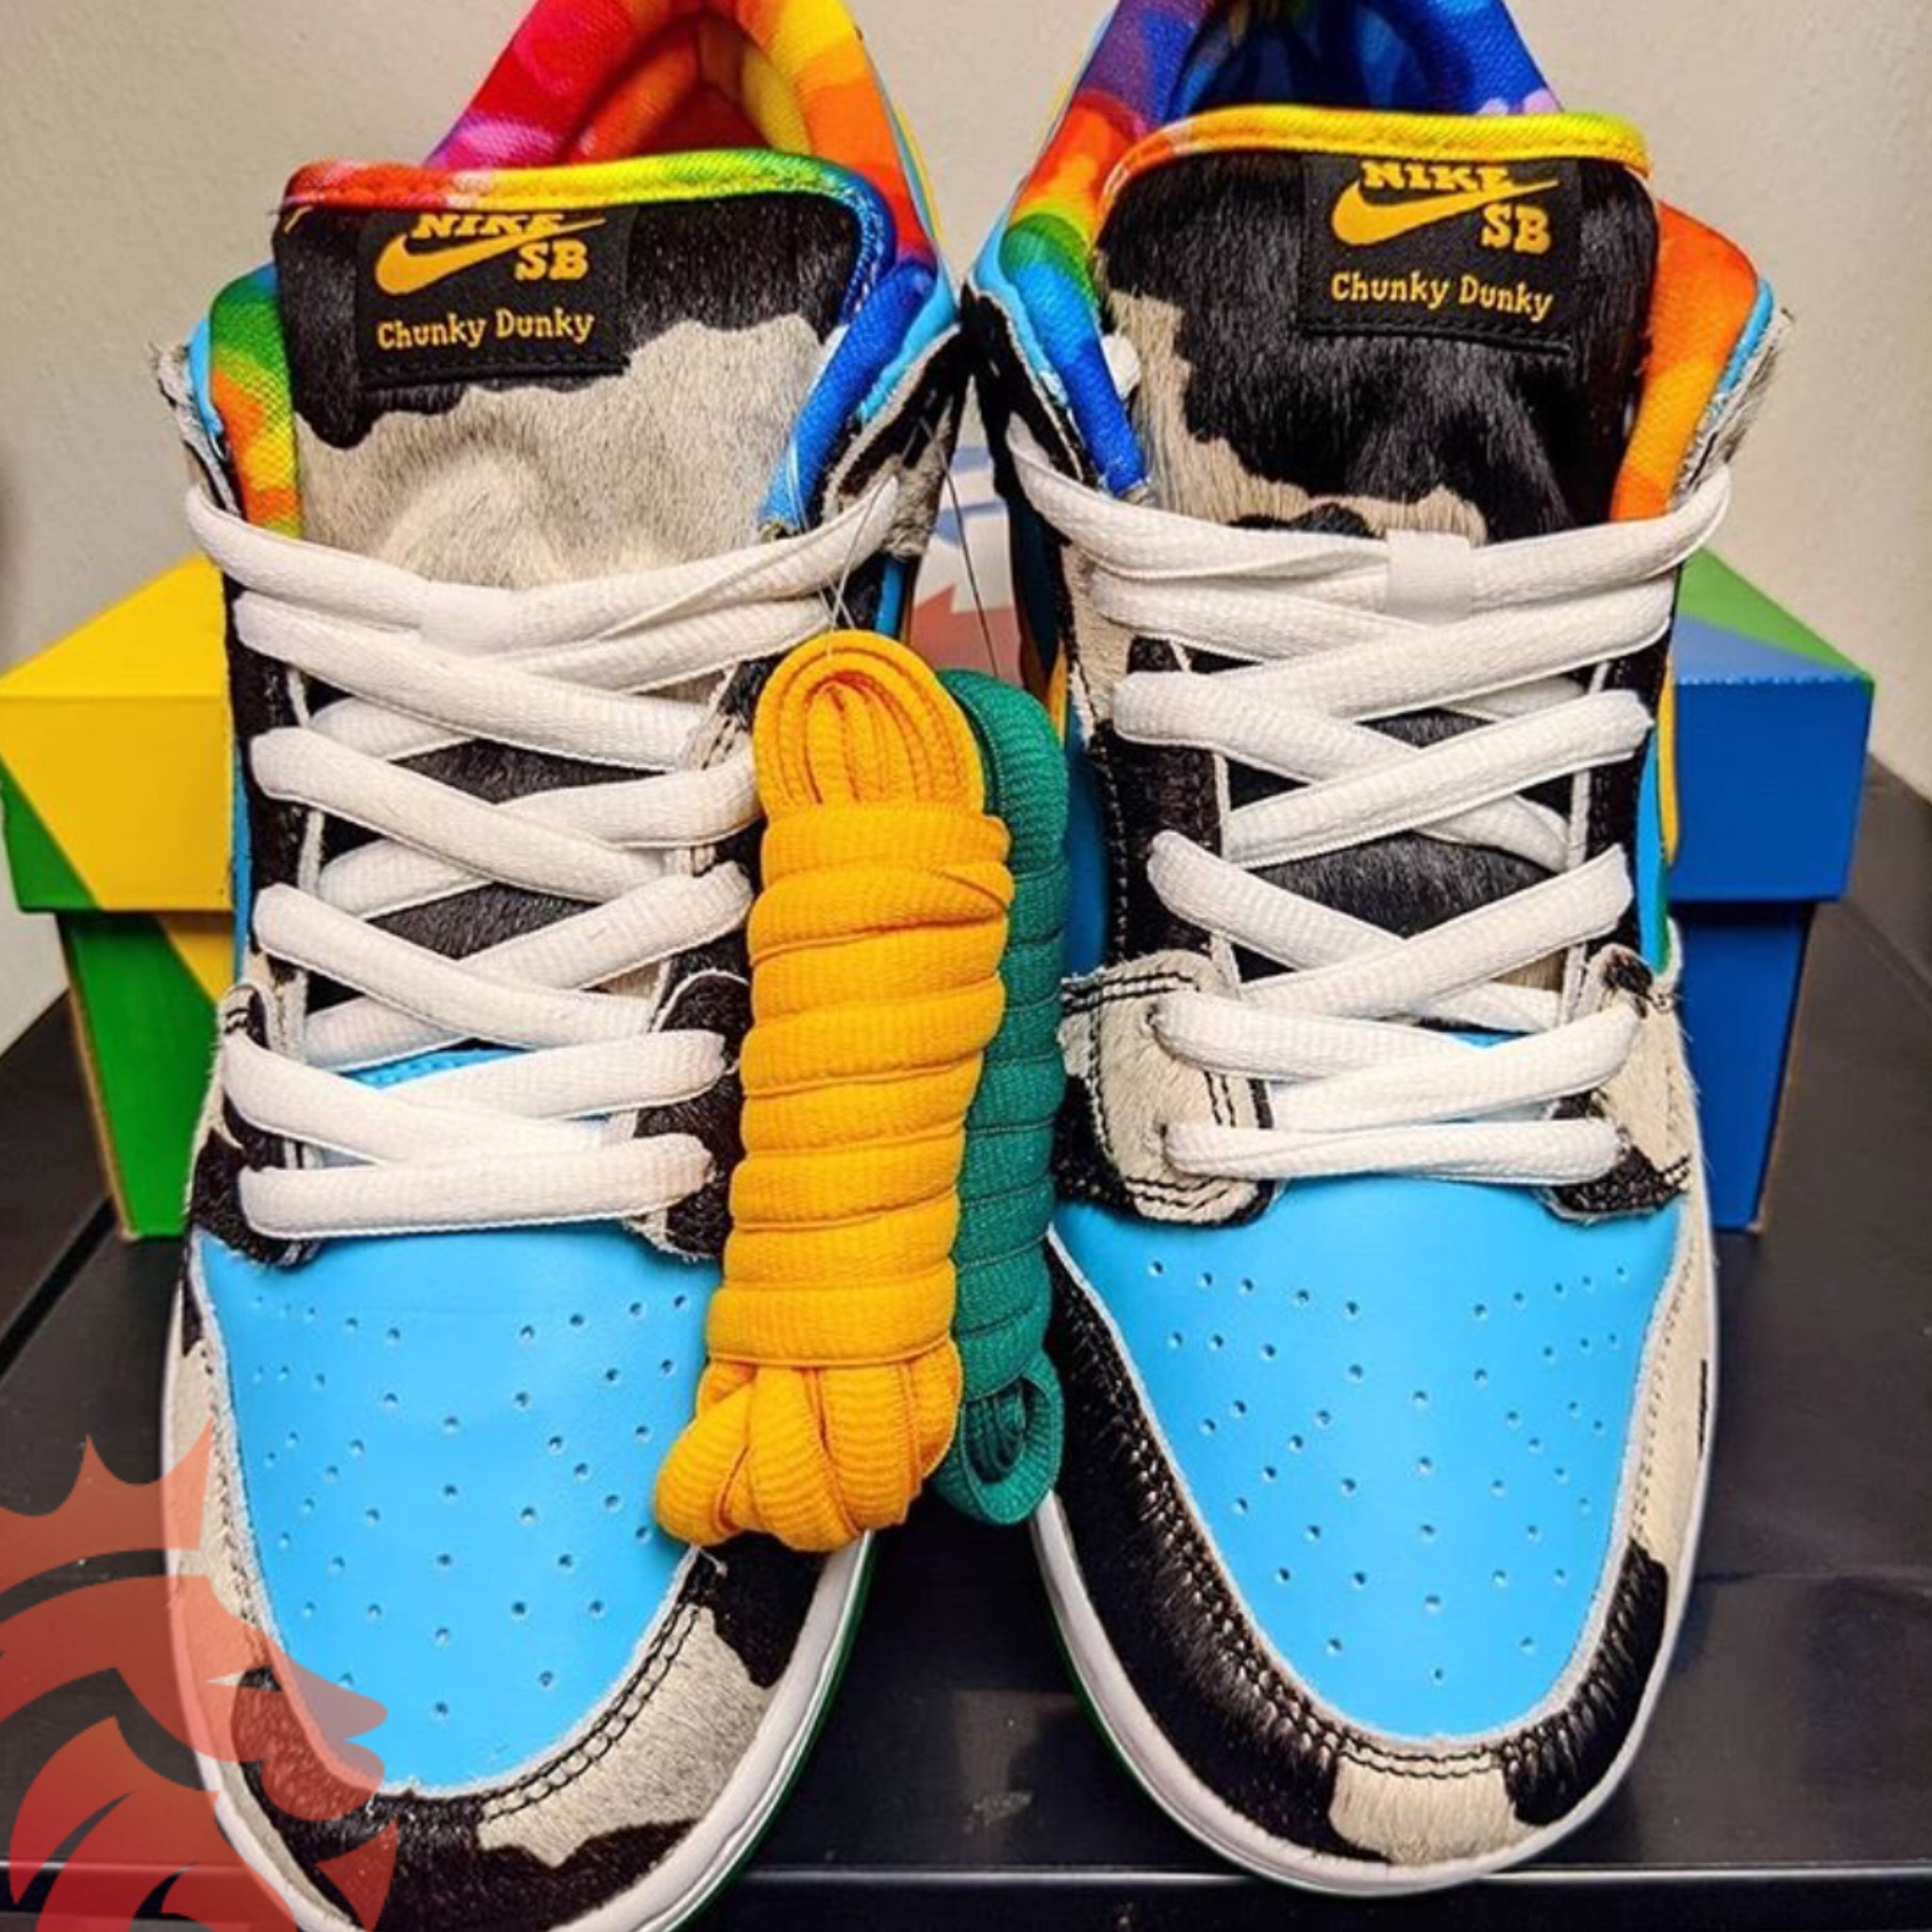 Ben & Jerry x Nike SB Dunk Chunky Dunky